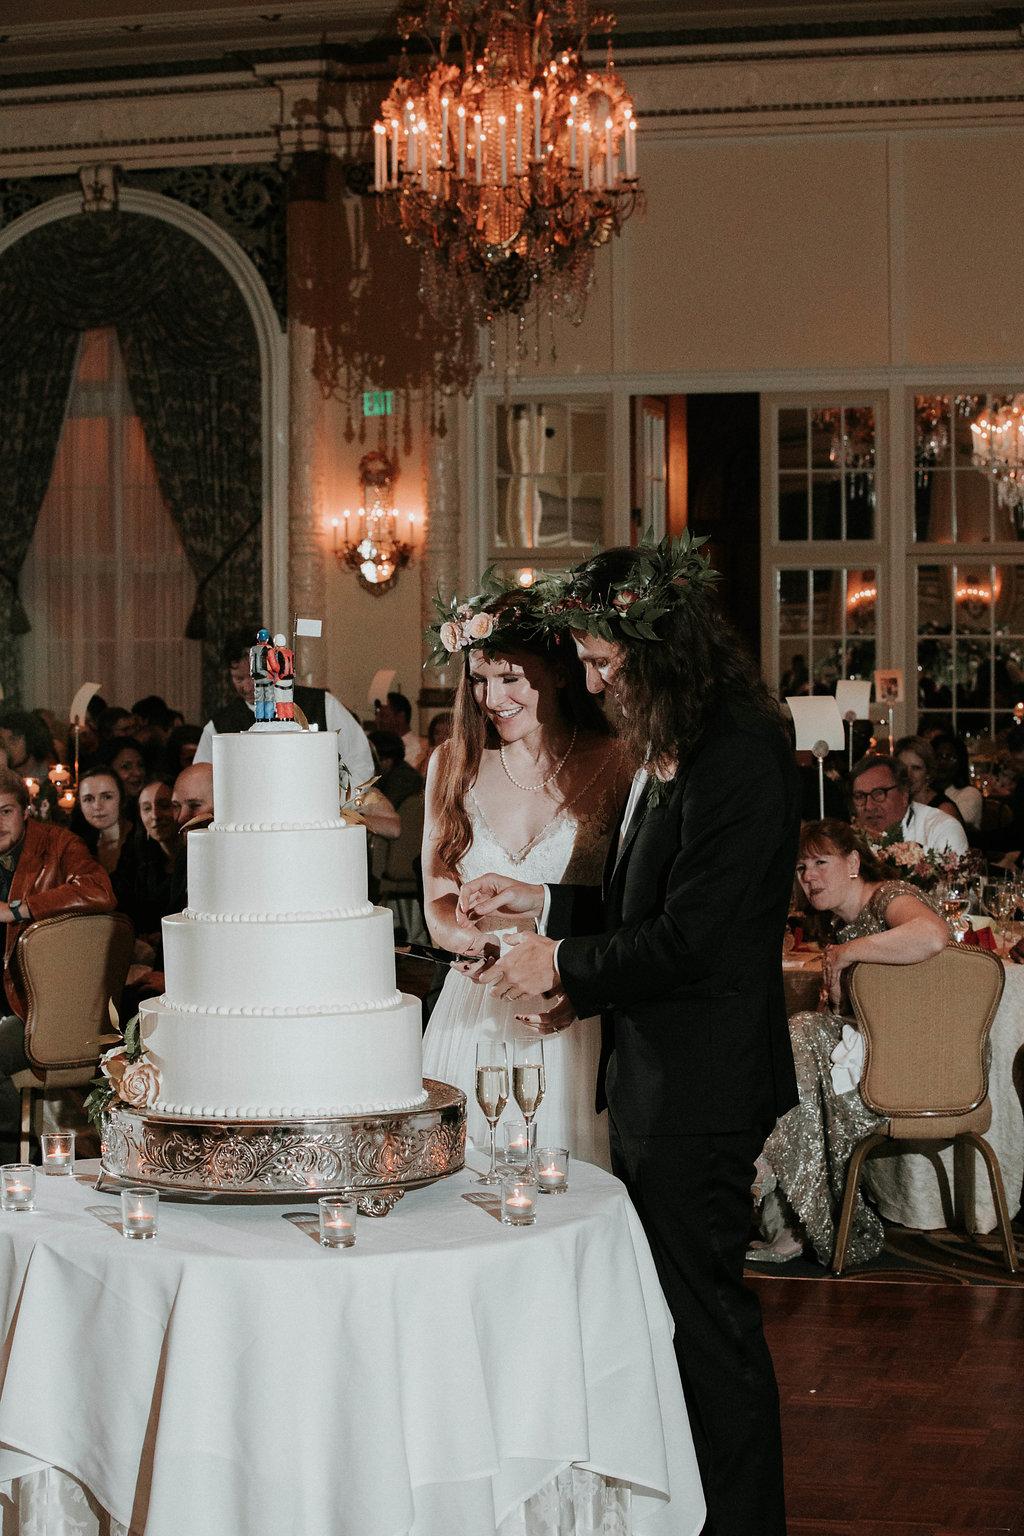 Fairmont Olympic Hotel Wedding Photos, Seattle Hotel Wedding by Adina Preston Photography